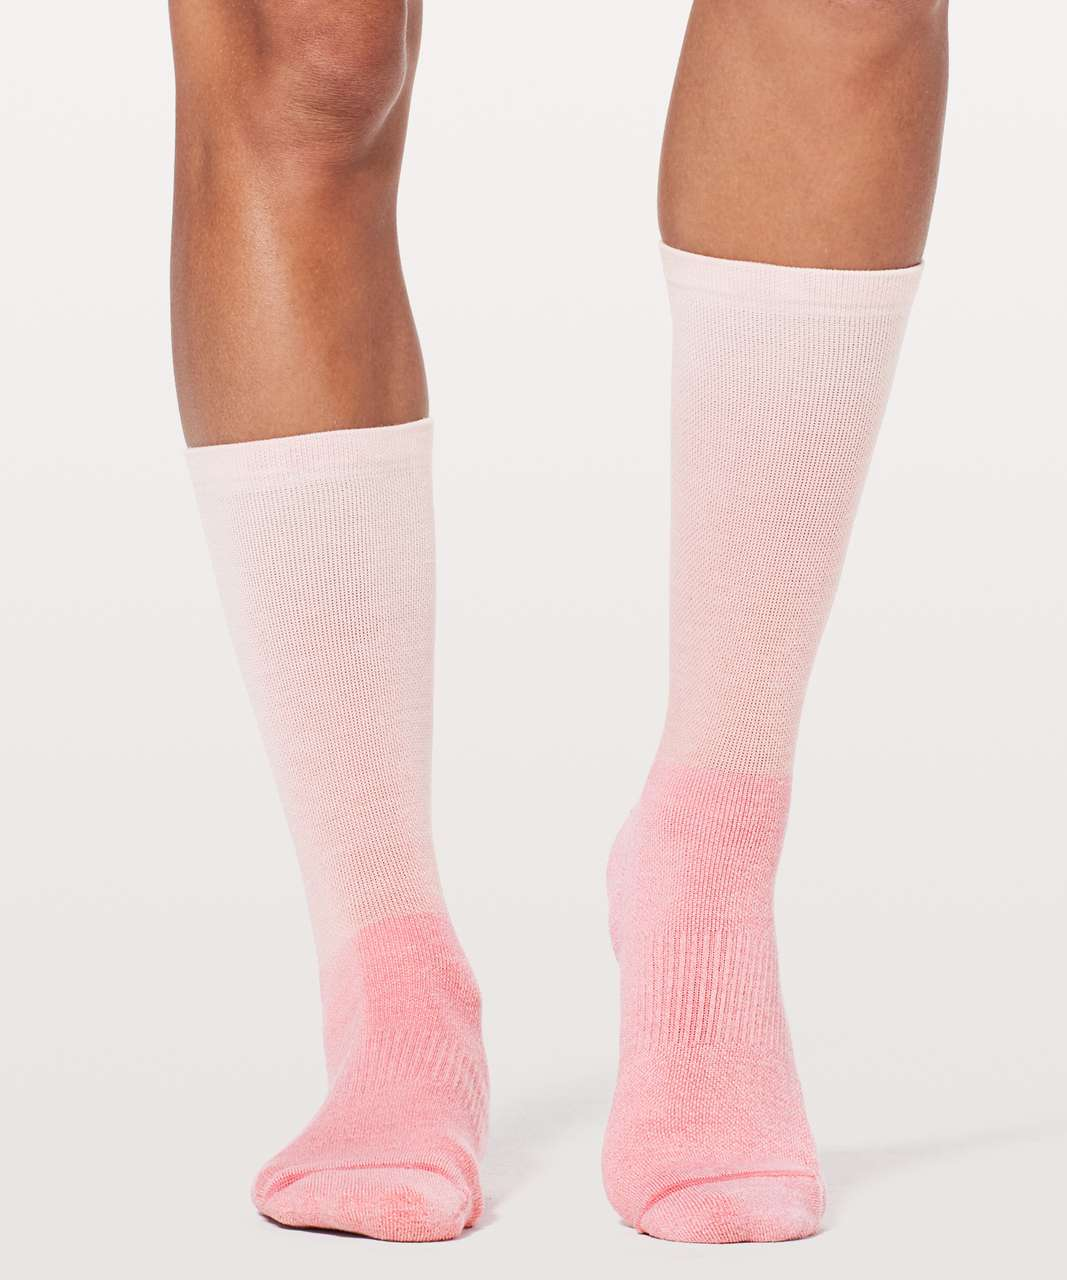 Lululemon Hit The Street Crew Sock - Petals / Fuchsia Pink